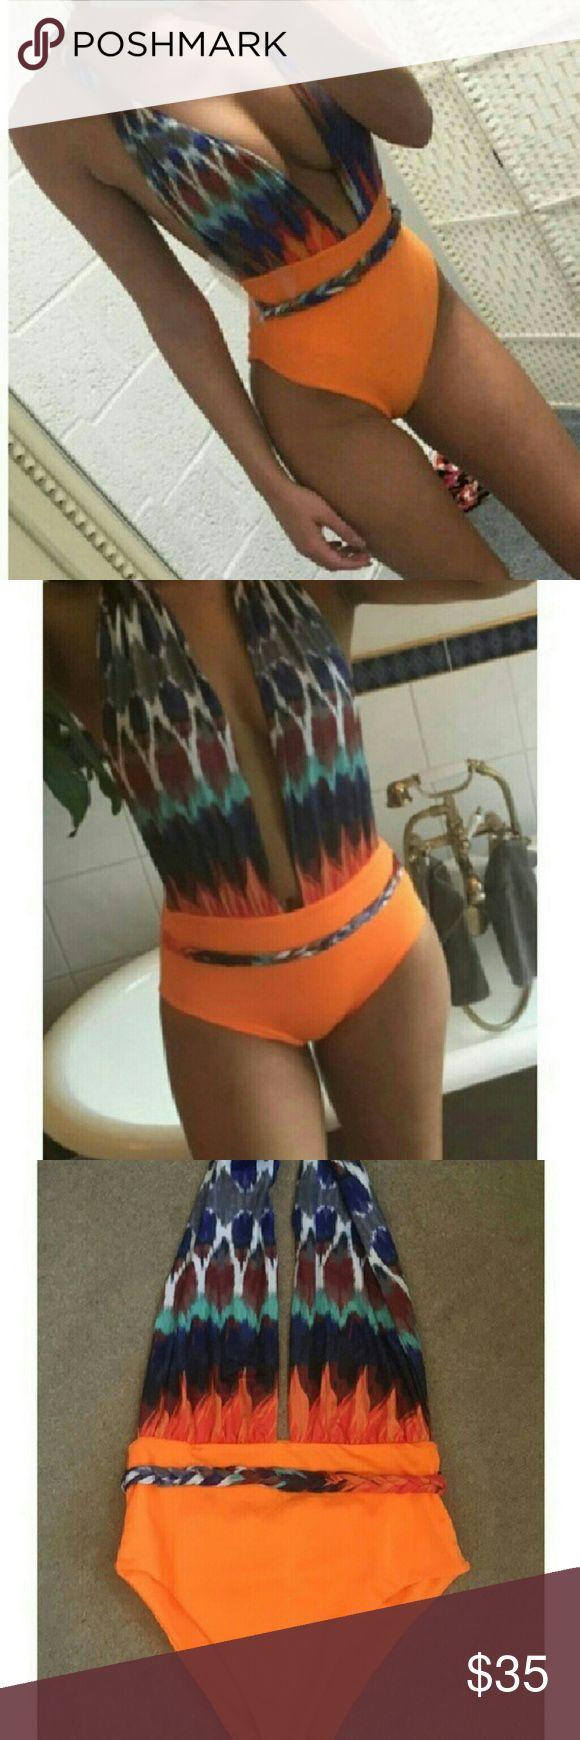 Sexy Orange Multi Colored One Piece Suit Brand New! Sexy Multi Colored orange one piece backless bathing suit. Medium: 33/36B to 33/36C 27/28 waist 35/36 hips. Swim One Pieces